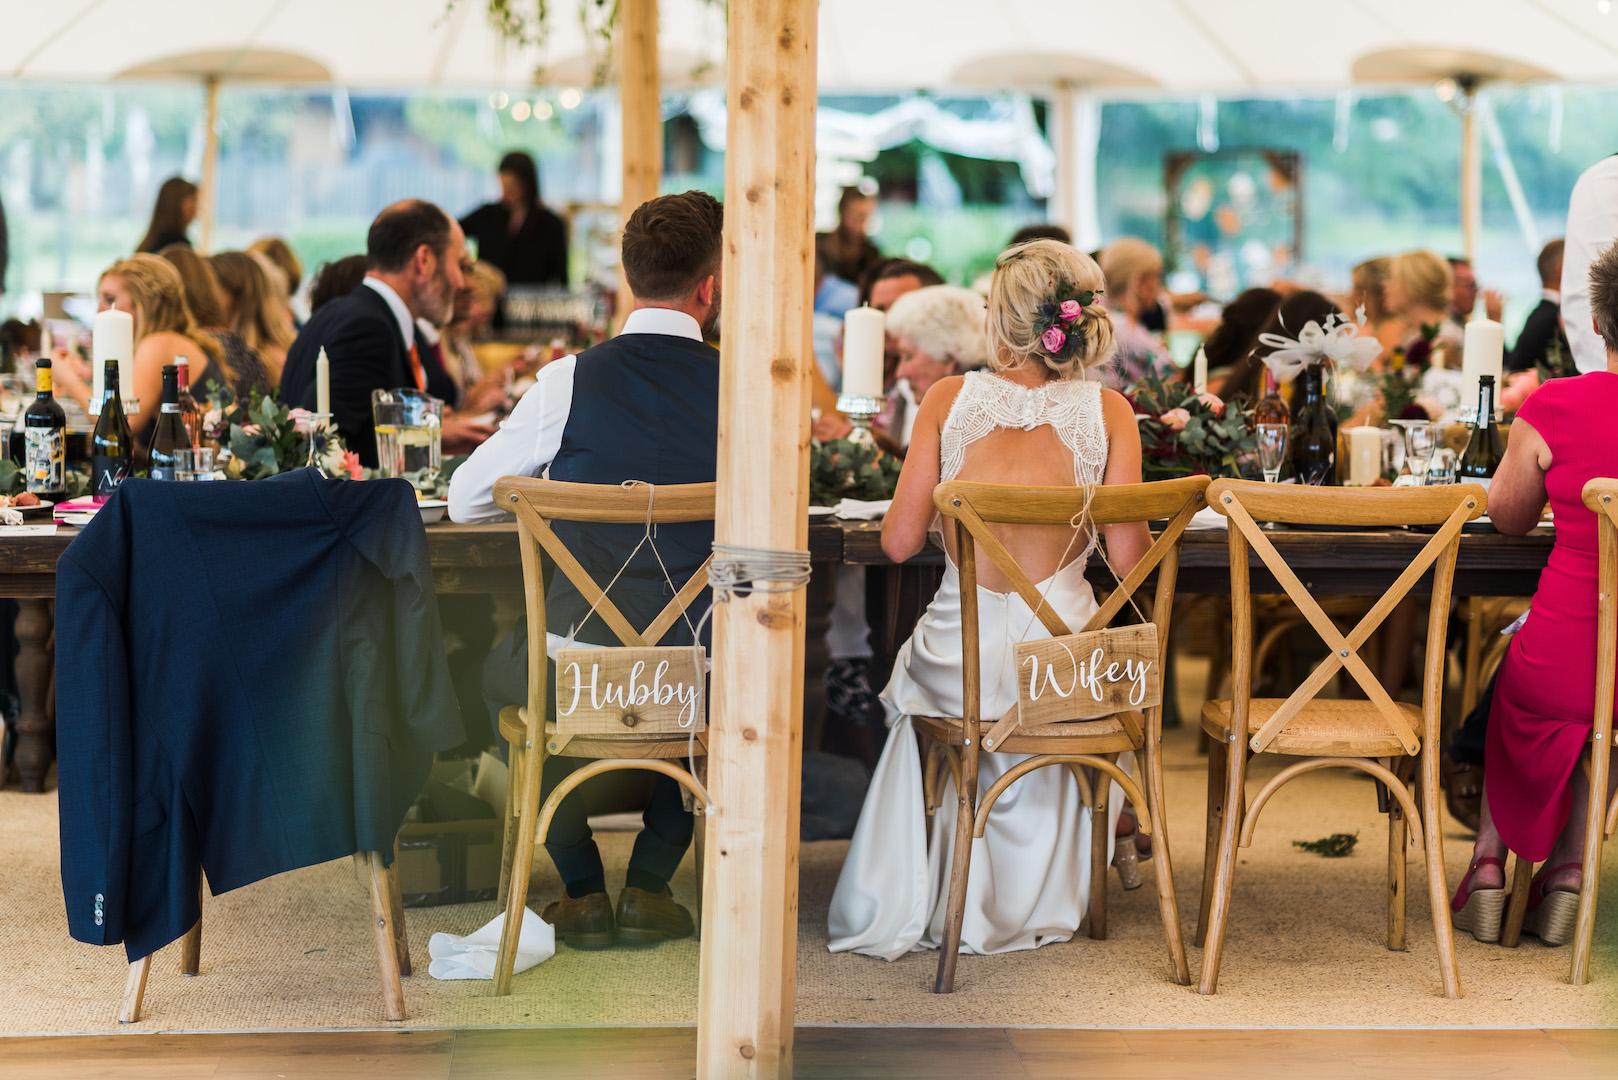 Sarah and Joe's PapaKata Sperry Wedding: Cross back chairs